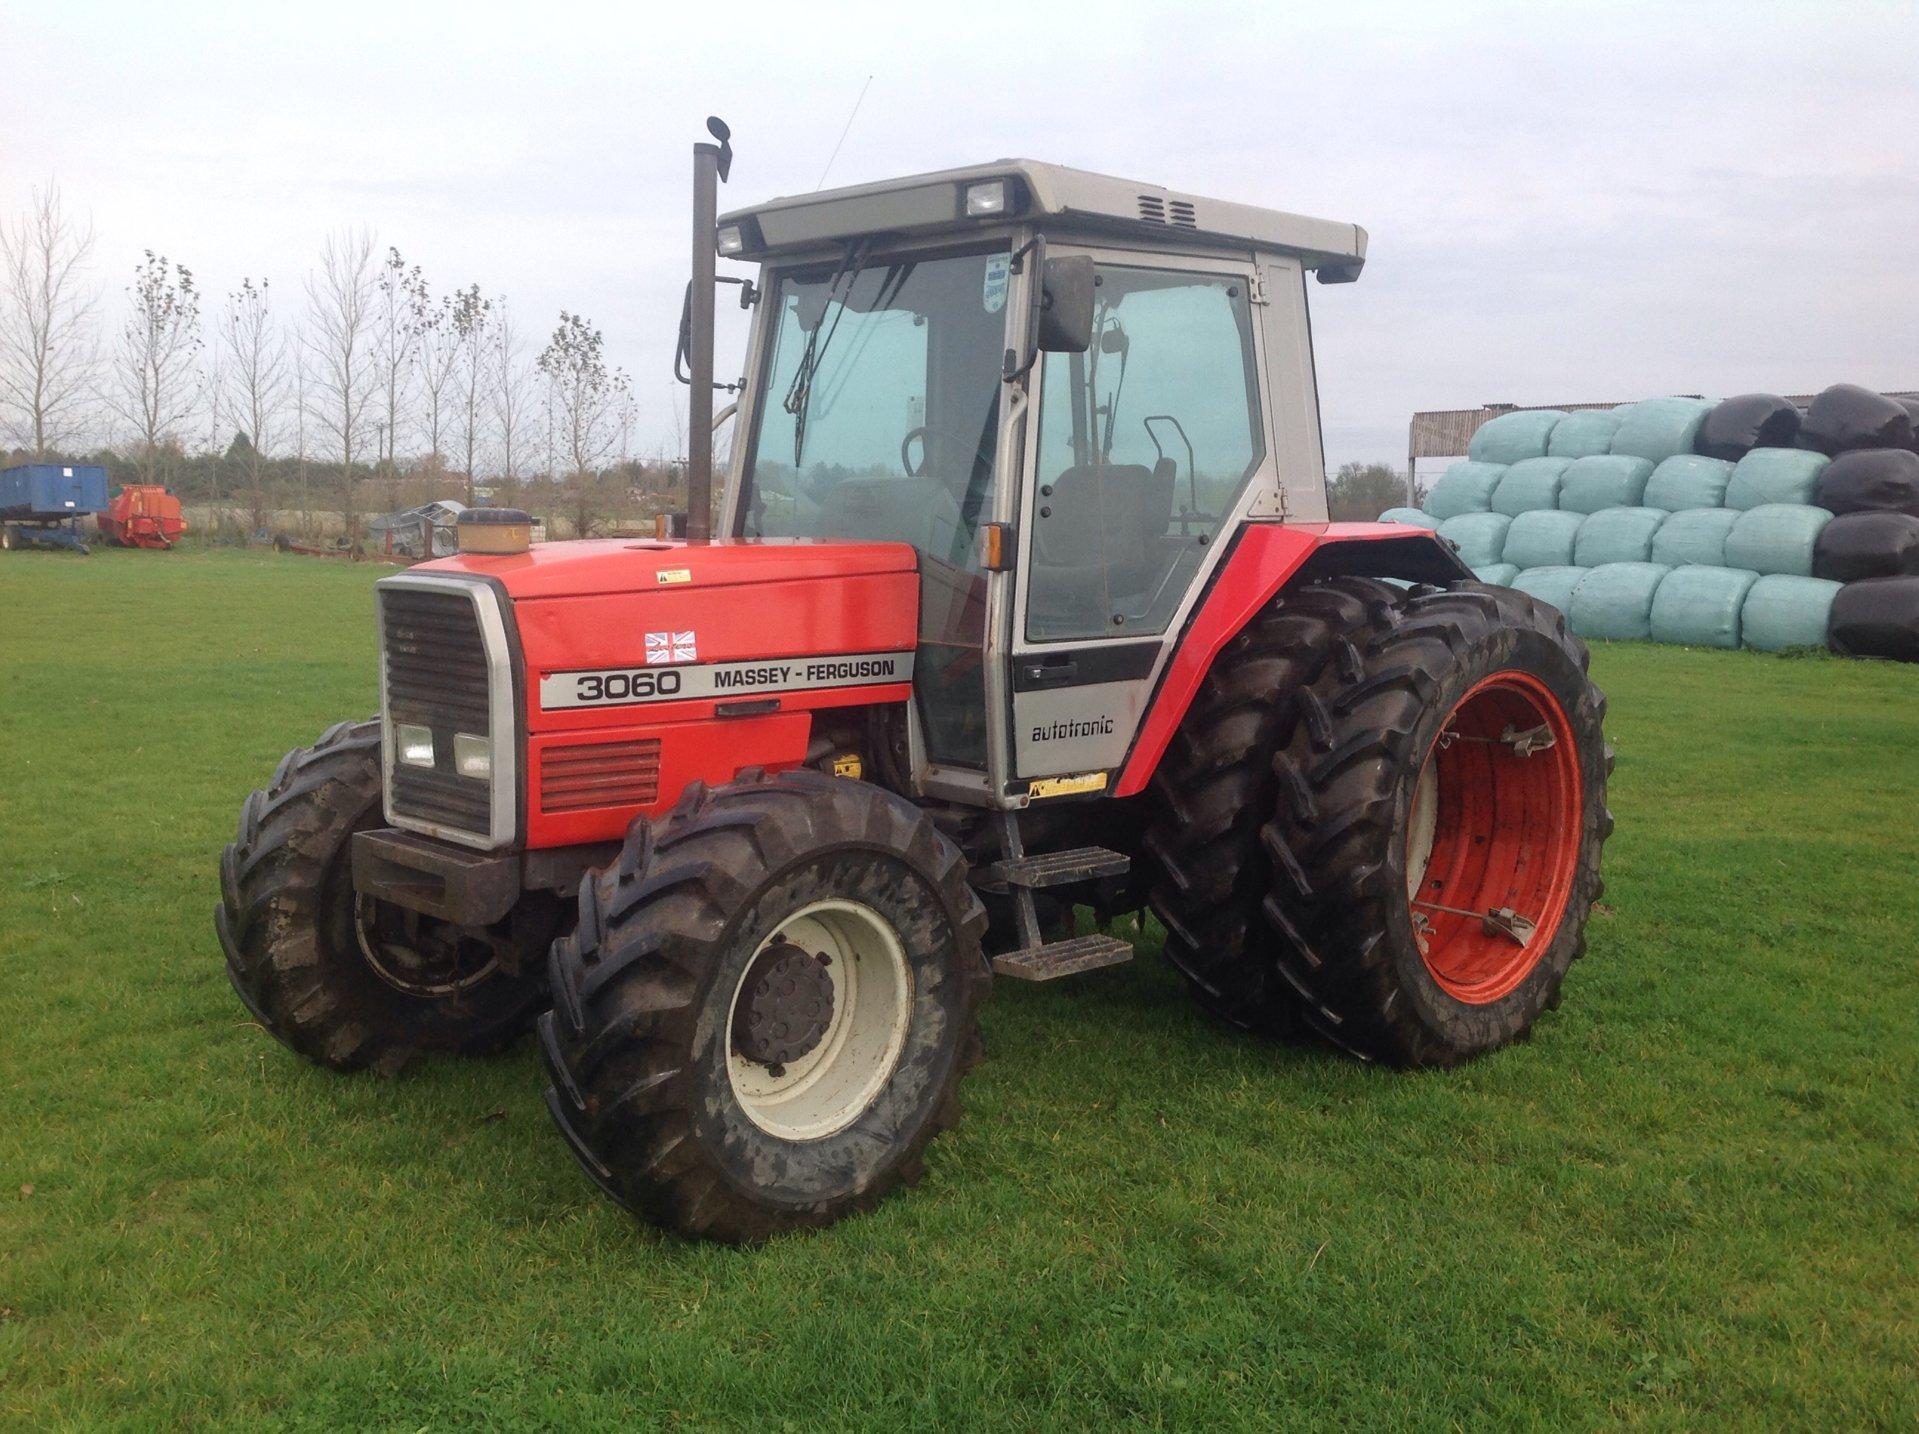 MF 3060 | The Farming Forum